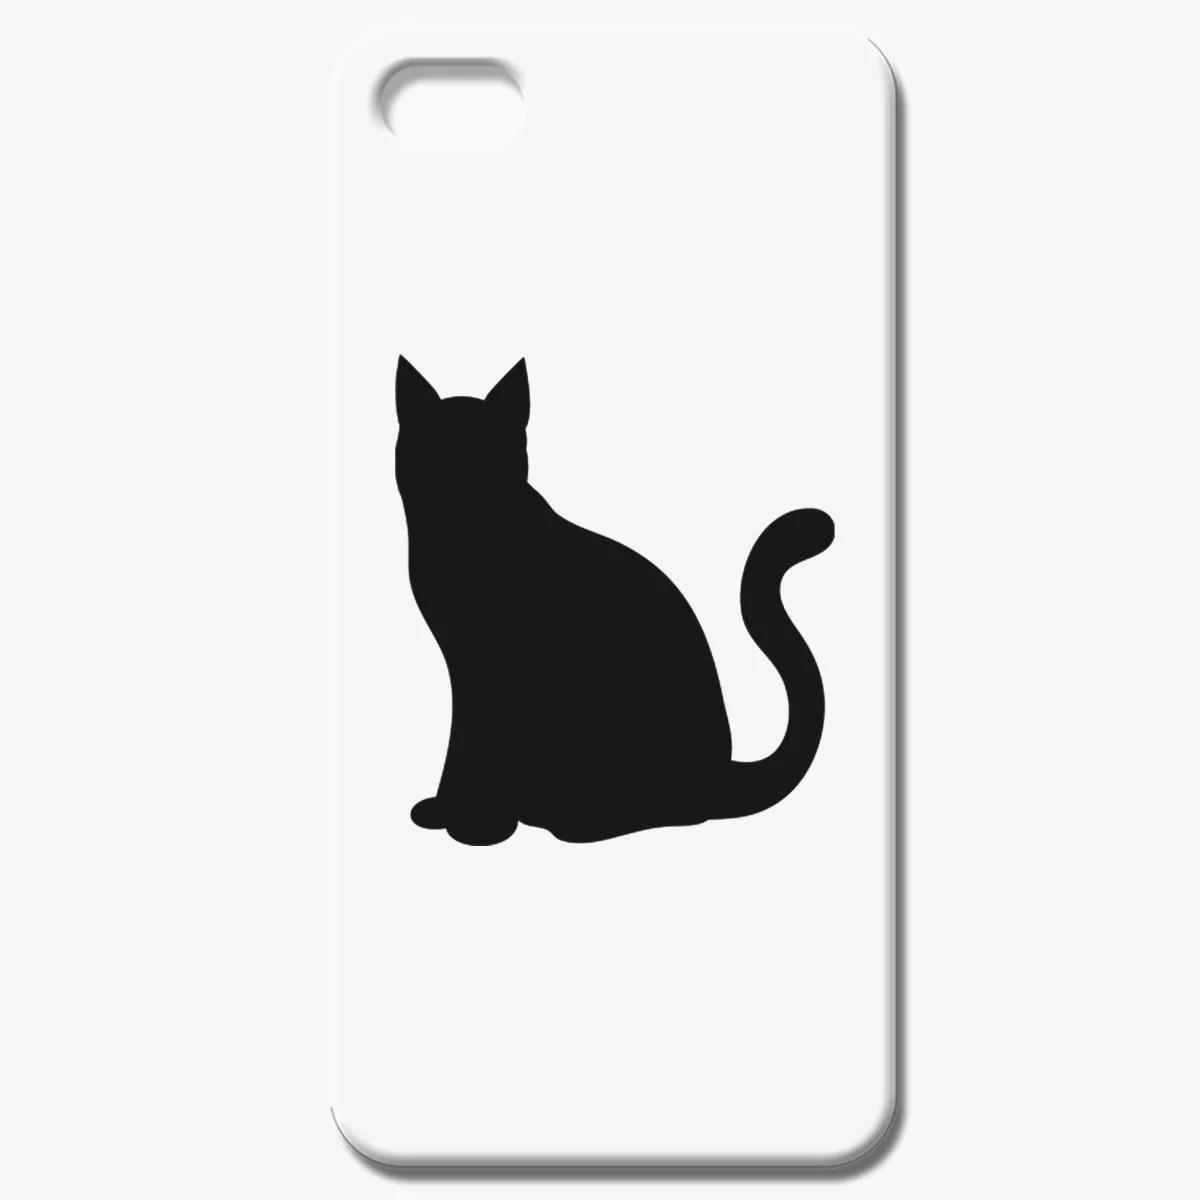 Cat Siluet Iphone 8 Case